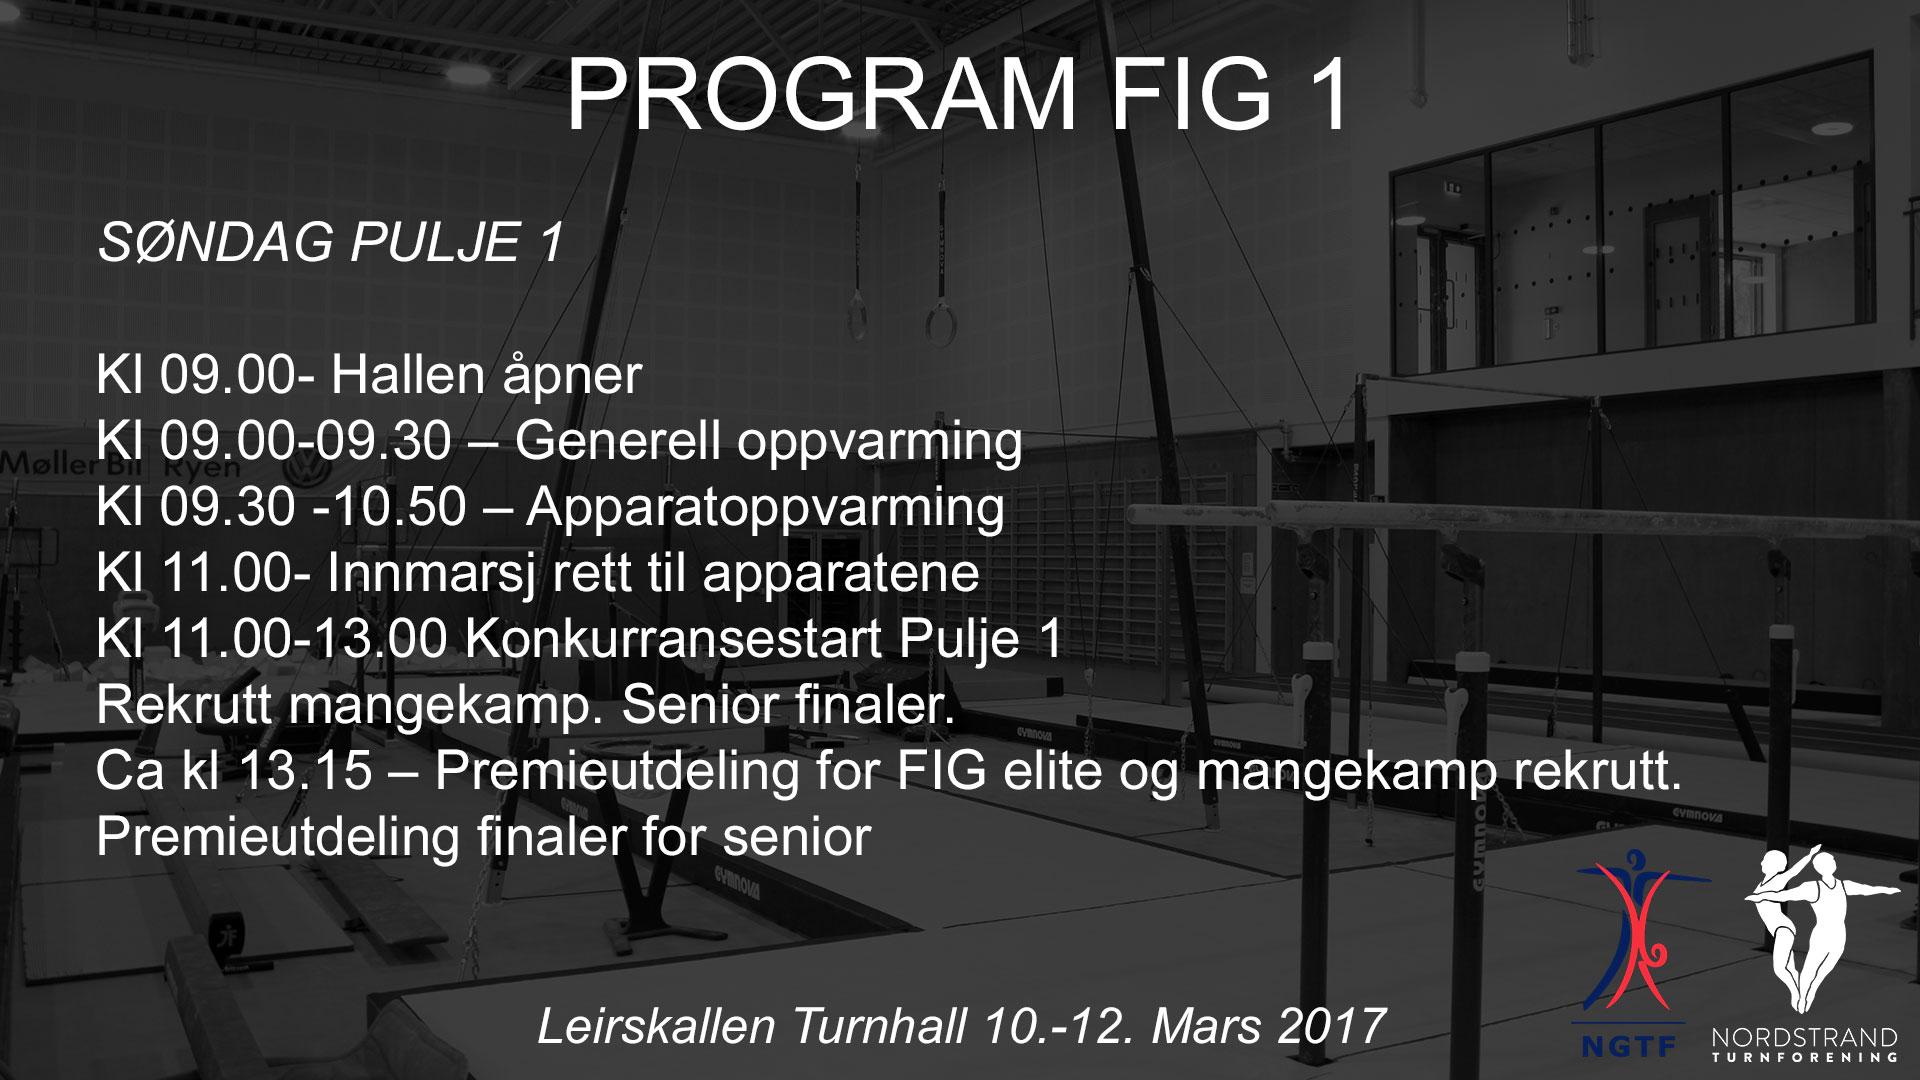 Program-FIG-1-Søndag-Pulje-1.jpg